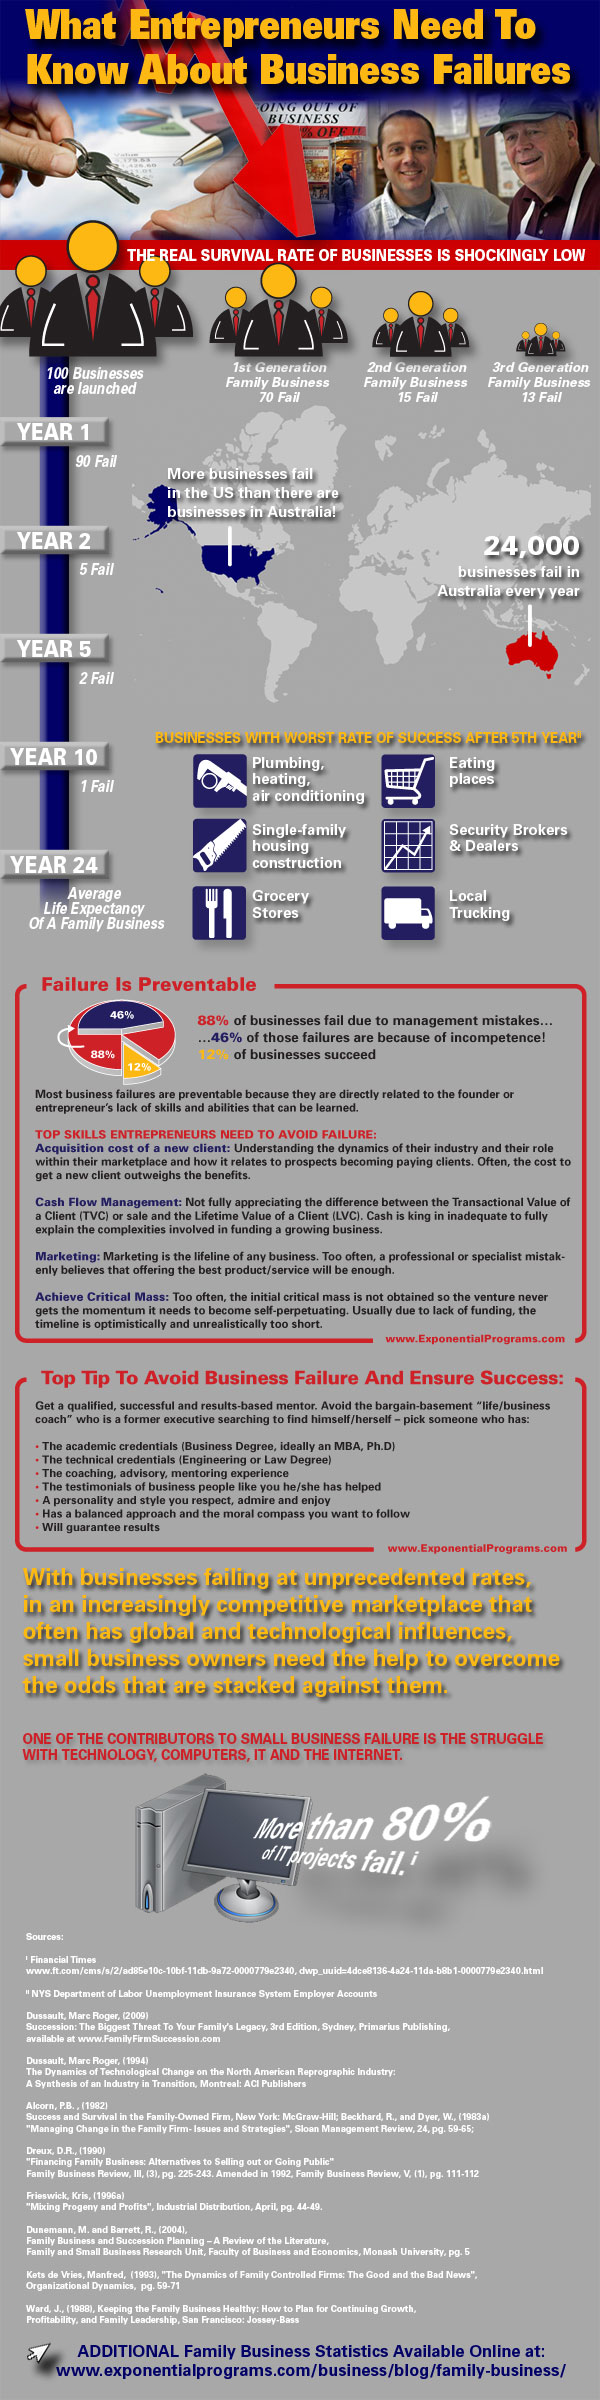 Family Business Failure Statistics